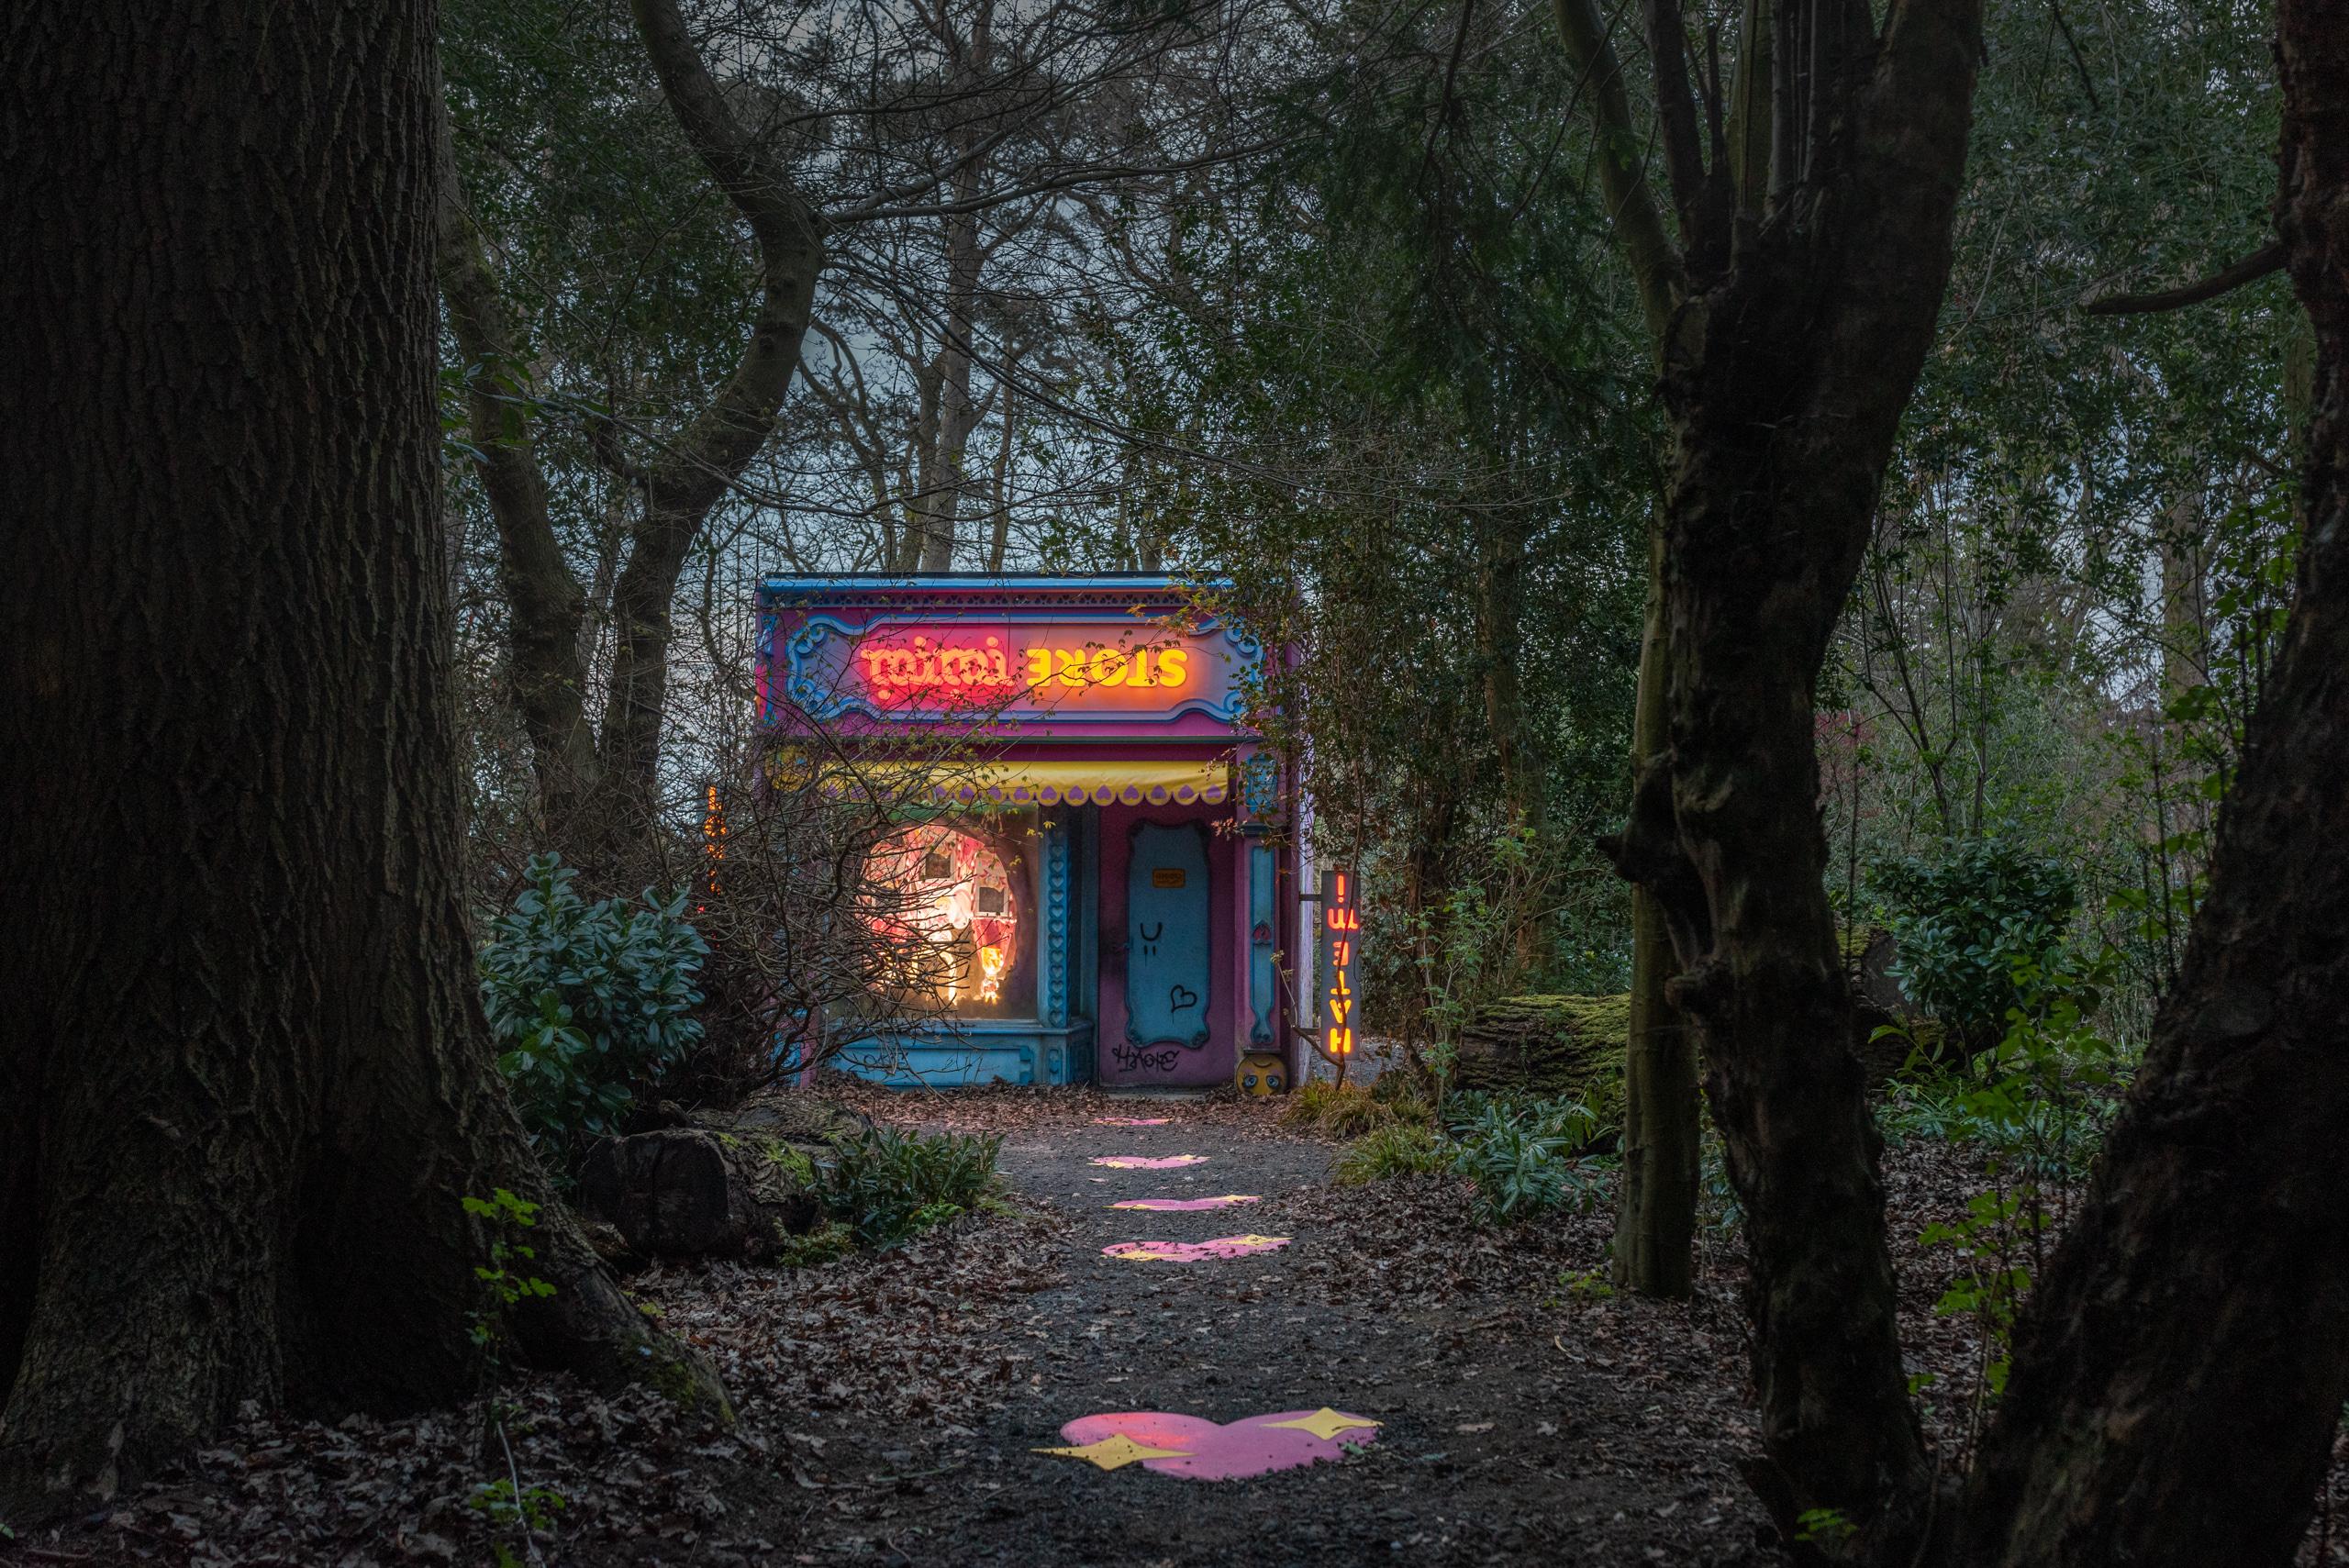 upside mimi ᴉɯᴉɯ uʍop, Rachel Maclean, 2021. Image, Amelia Claudia, courtesy, Jupiter Artland